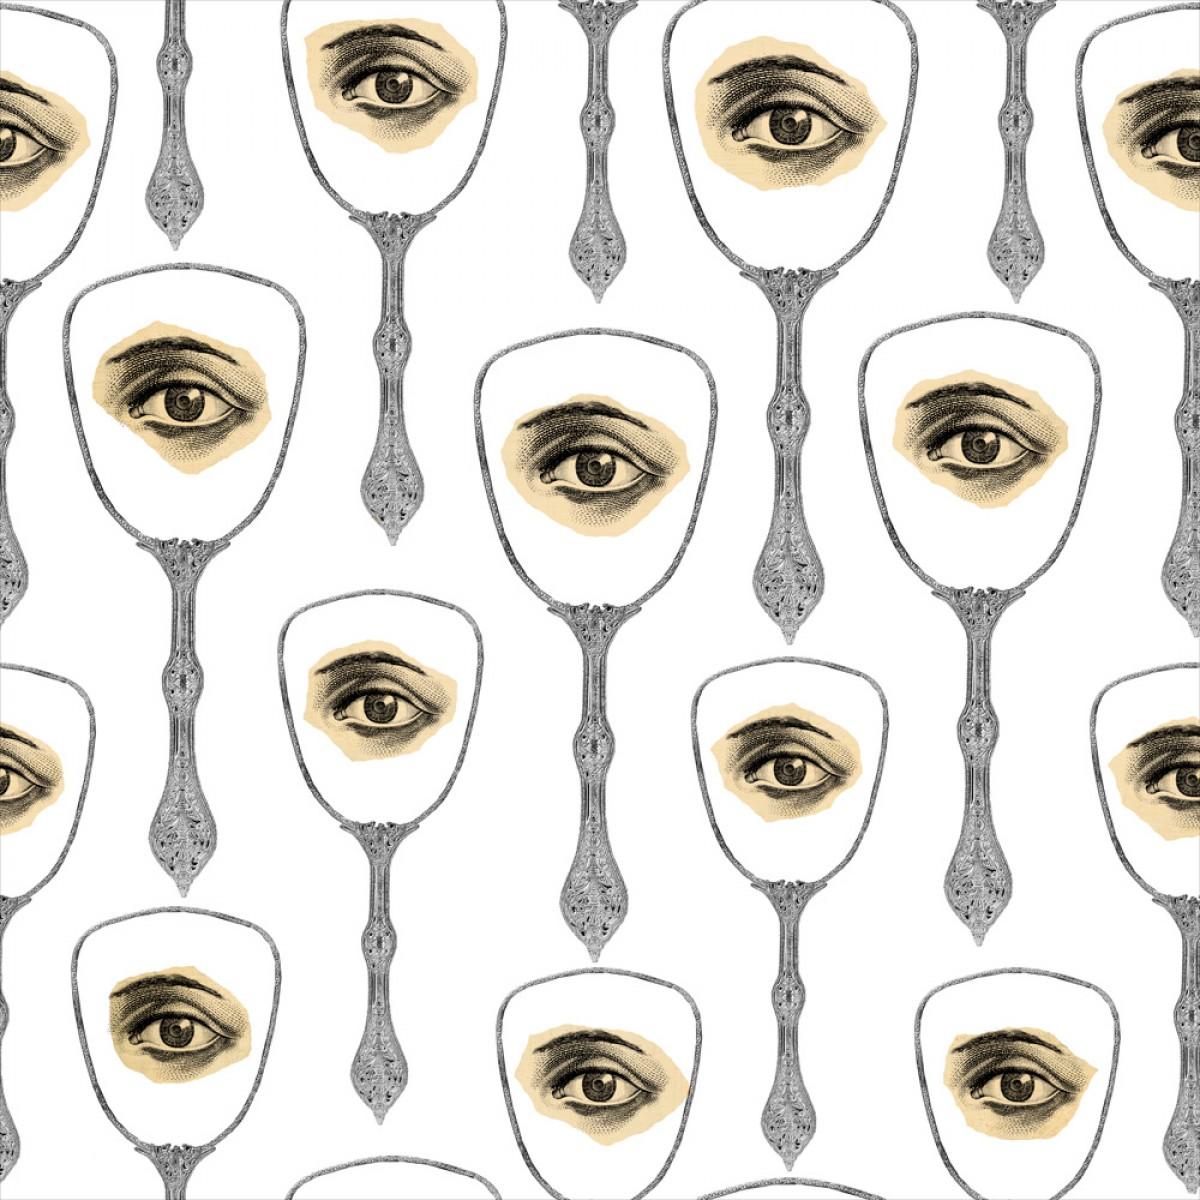 Tapet designer Illusions Mirror s Eye Neutral, MINDTHEGAP